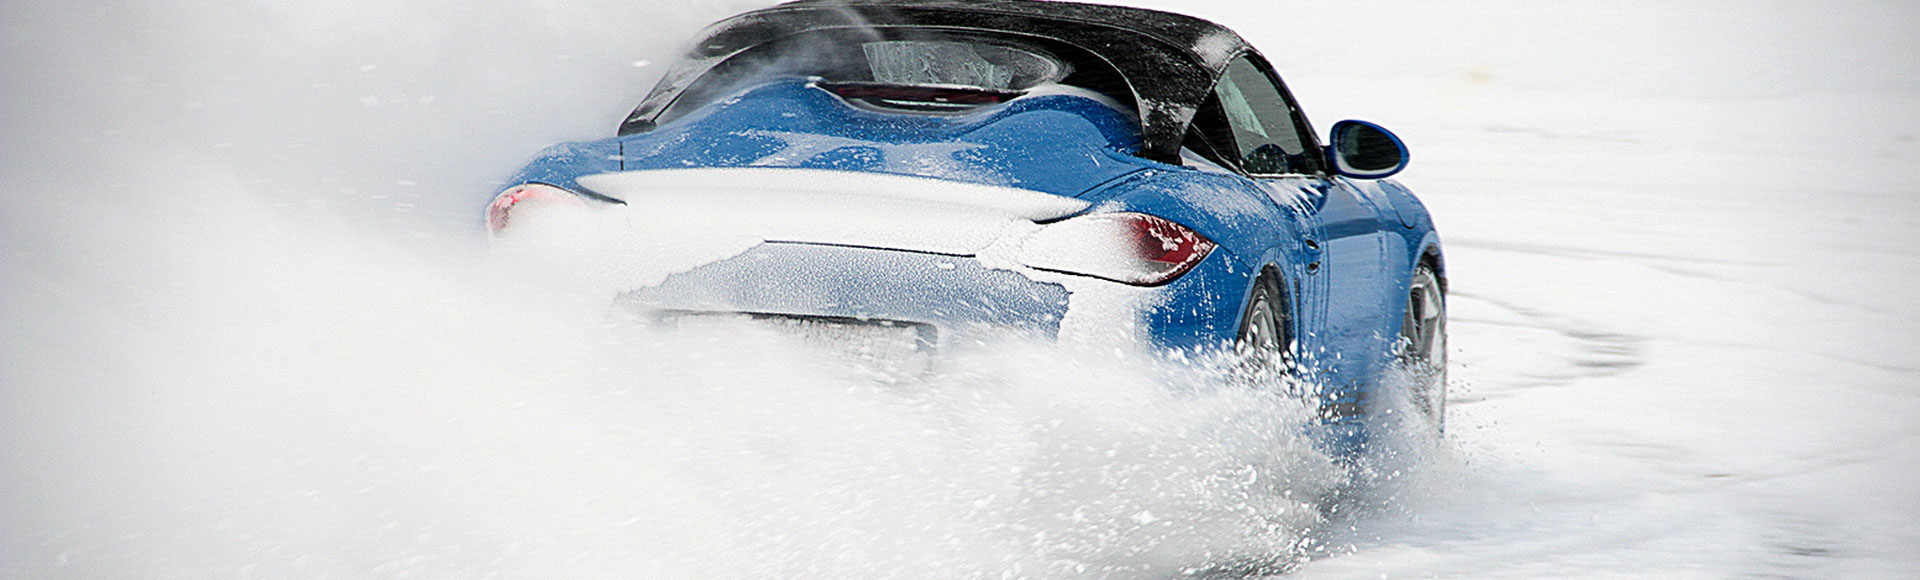 Porsche Boxster Lappland 2013 Winter 100